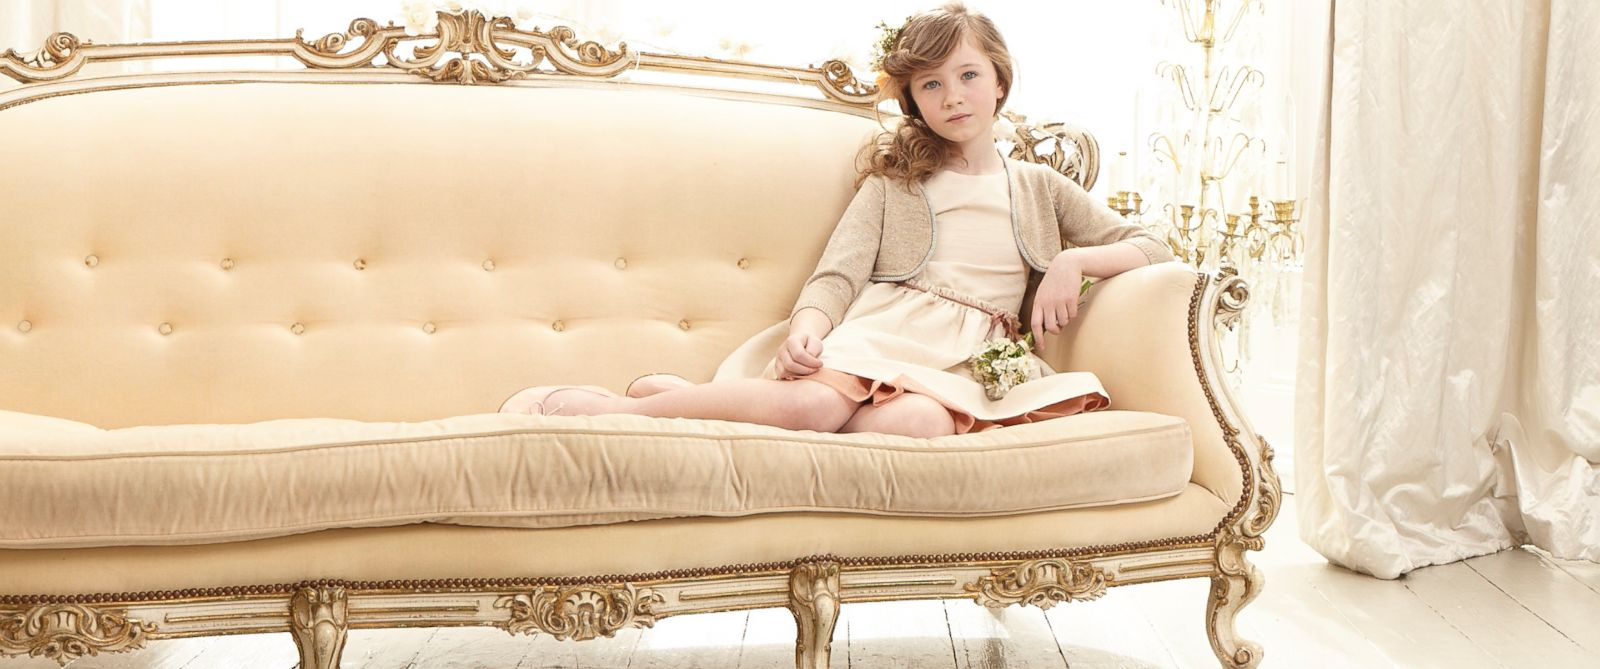 PHOTO: Jacquard Dress by Marie-Chantal Children